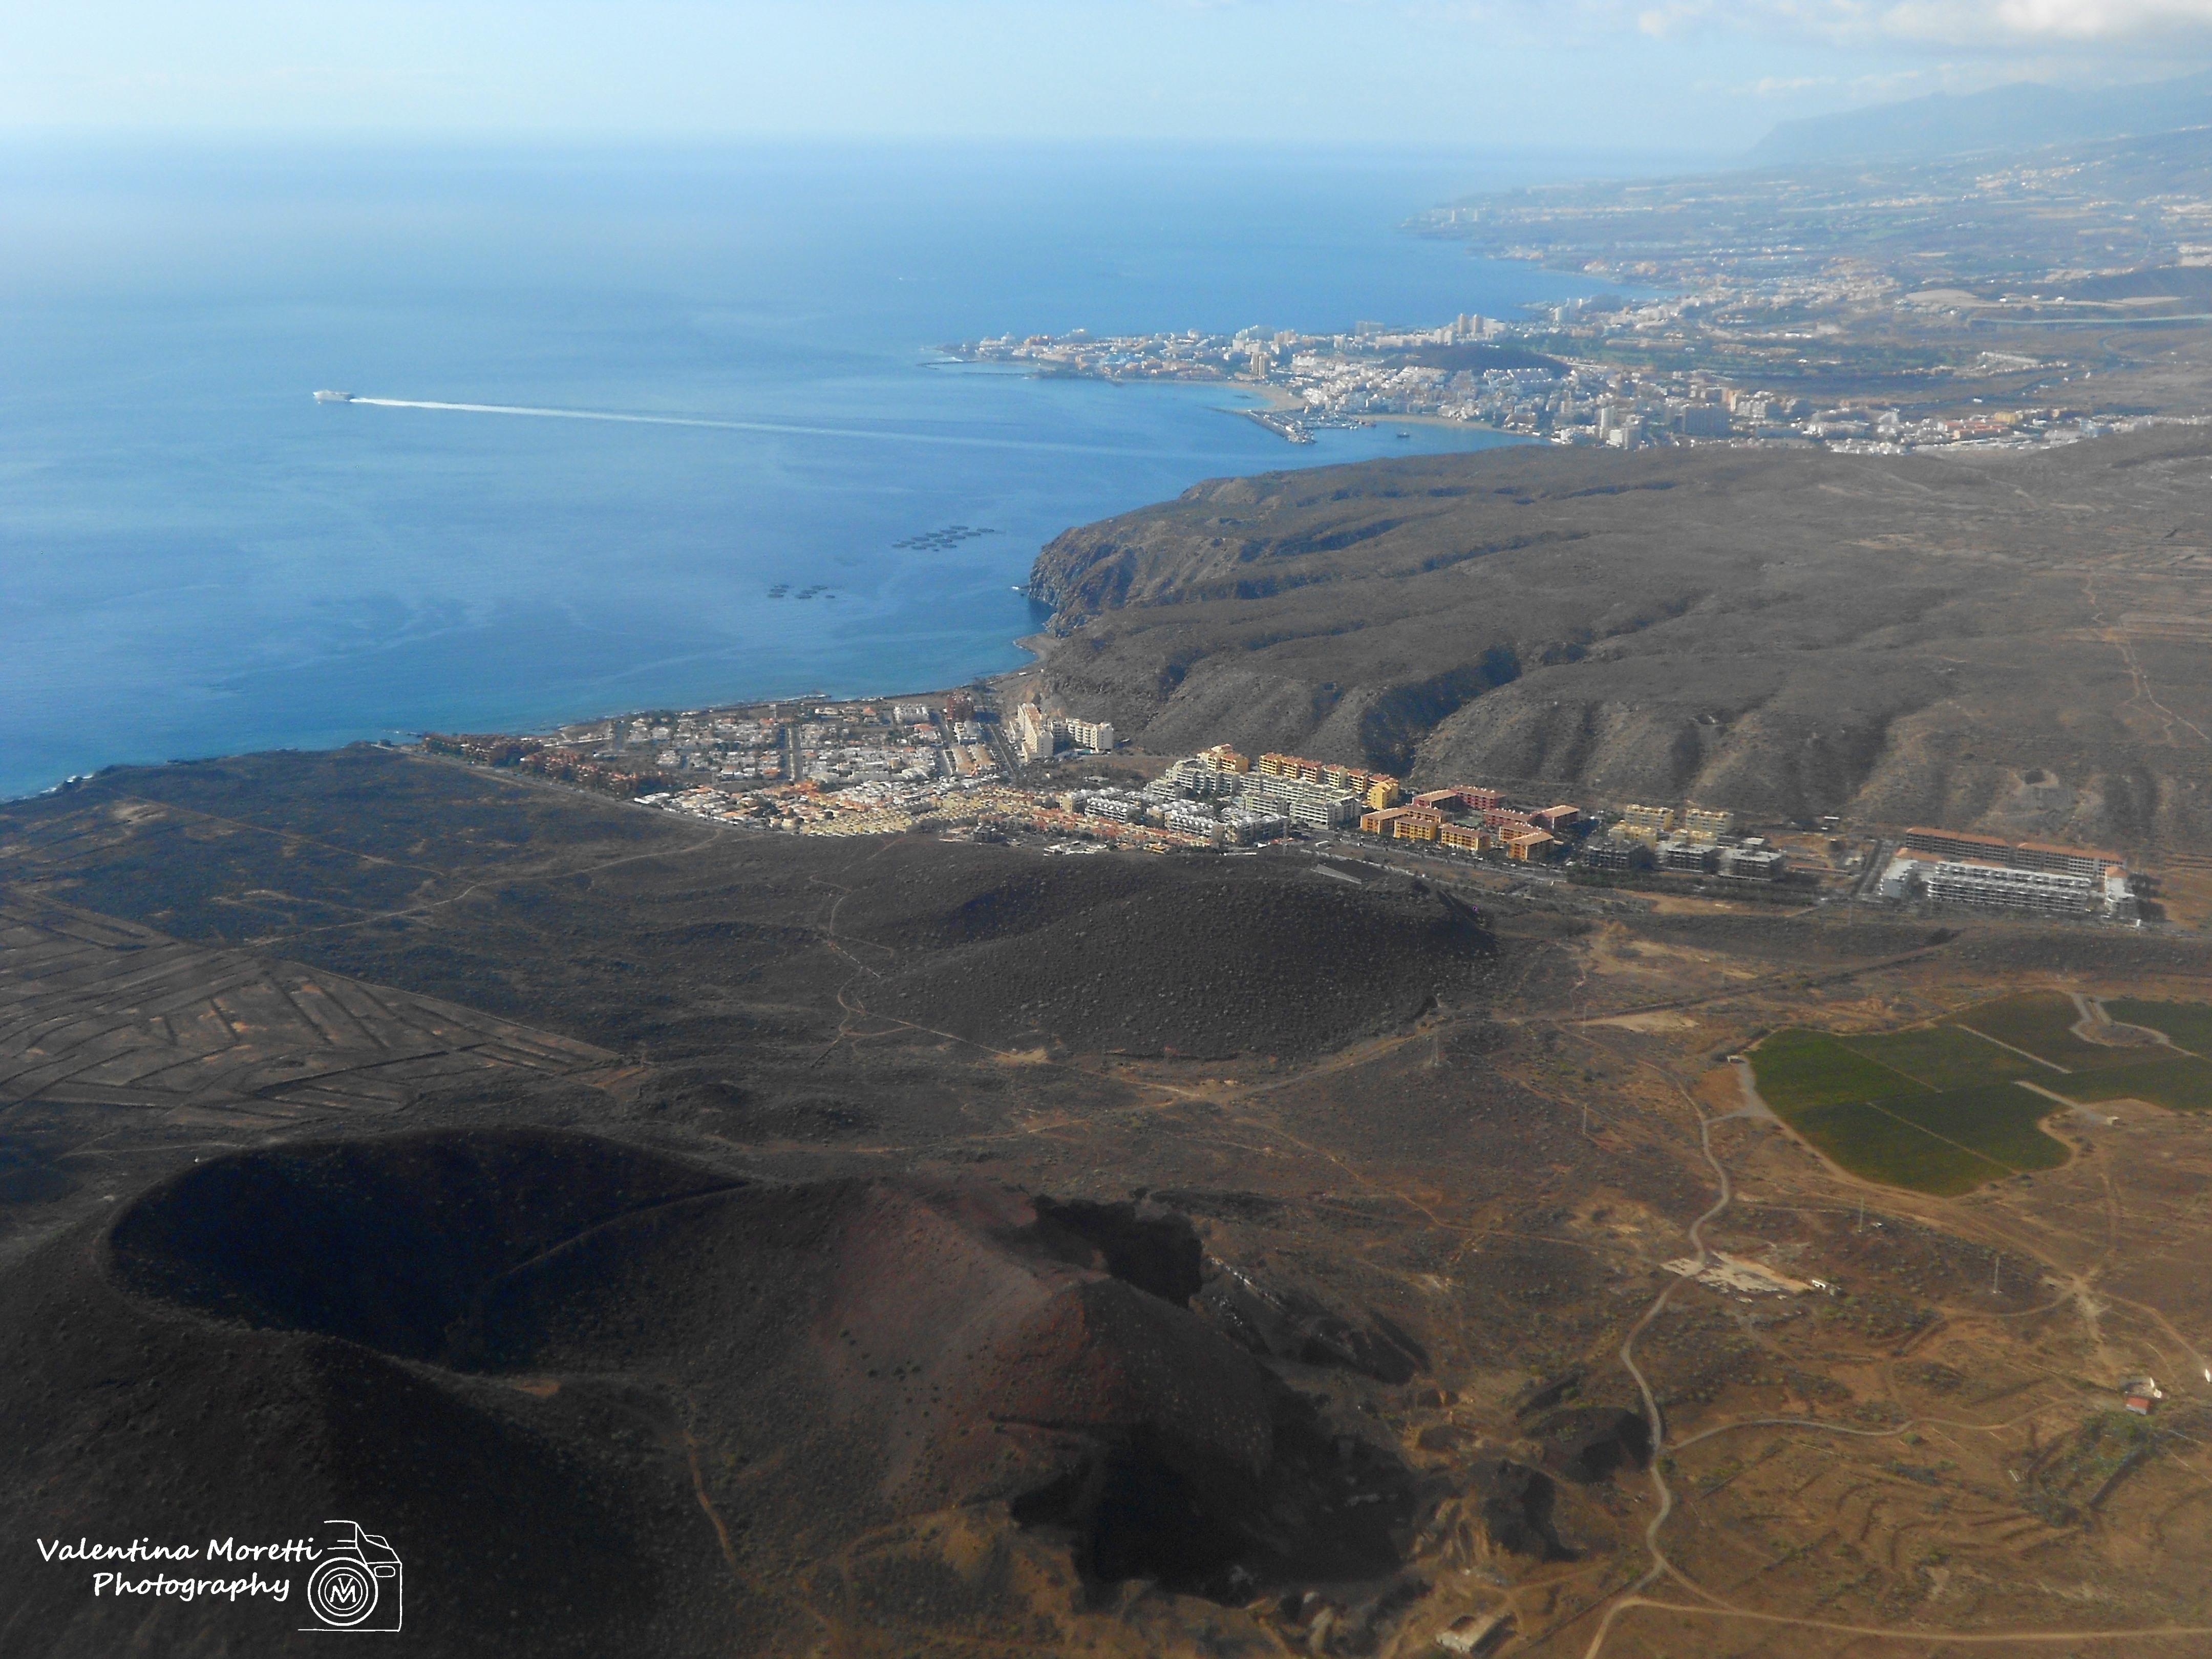 Tenerife vista dall'aereo